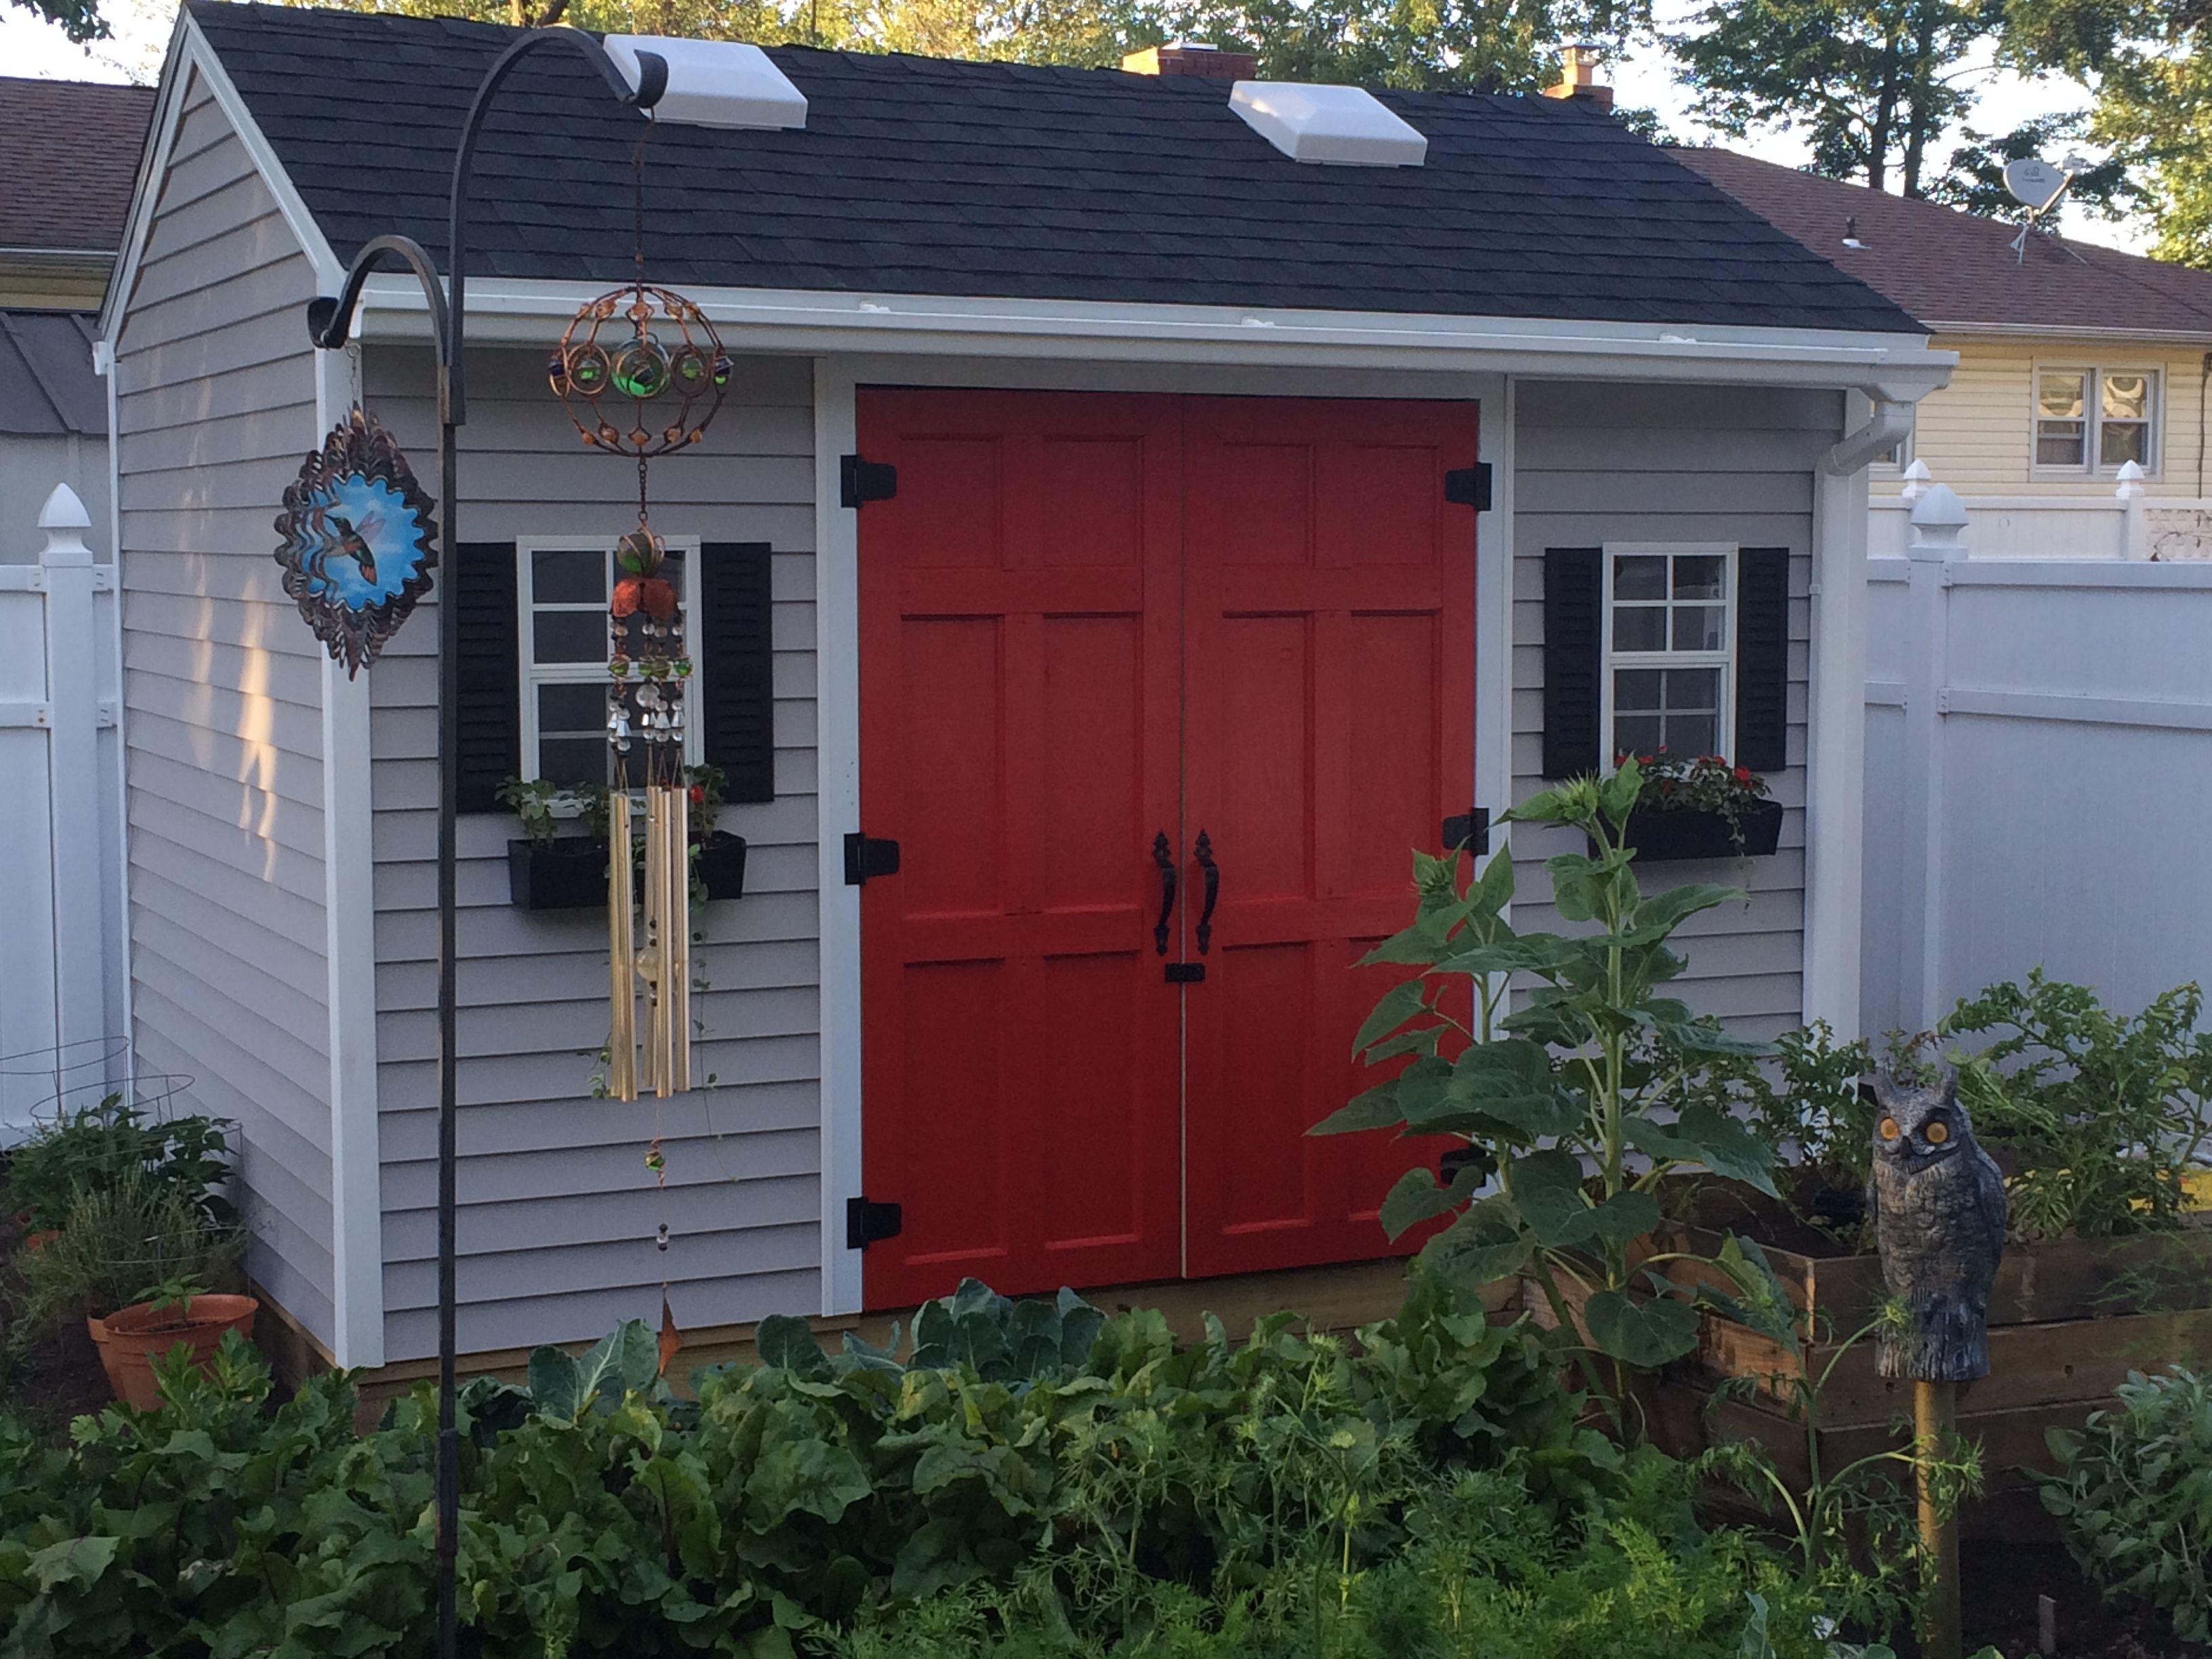 Part 2/3 of Backyard Improvements - DIY Shed Build # ...